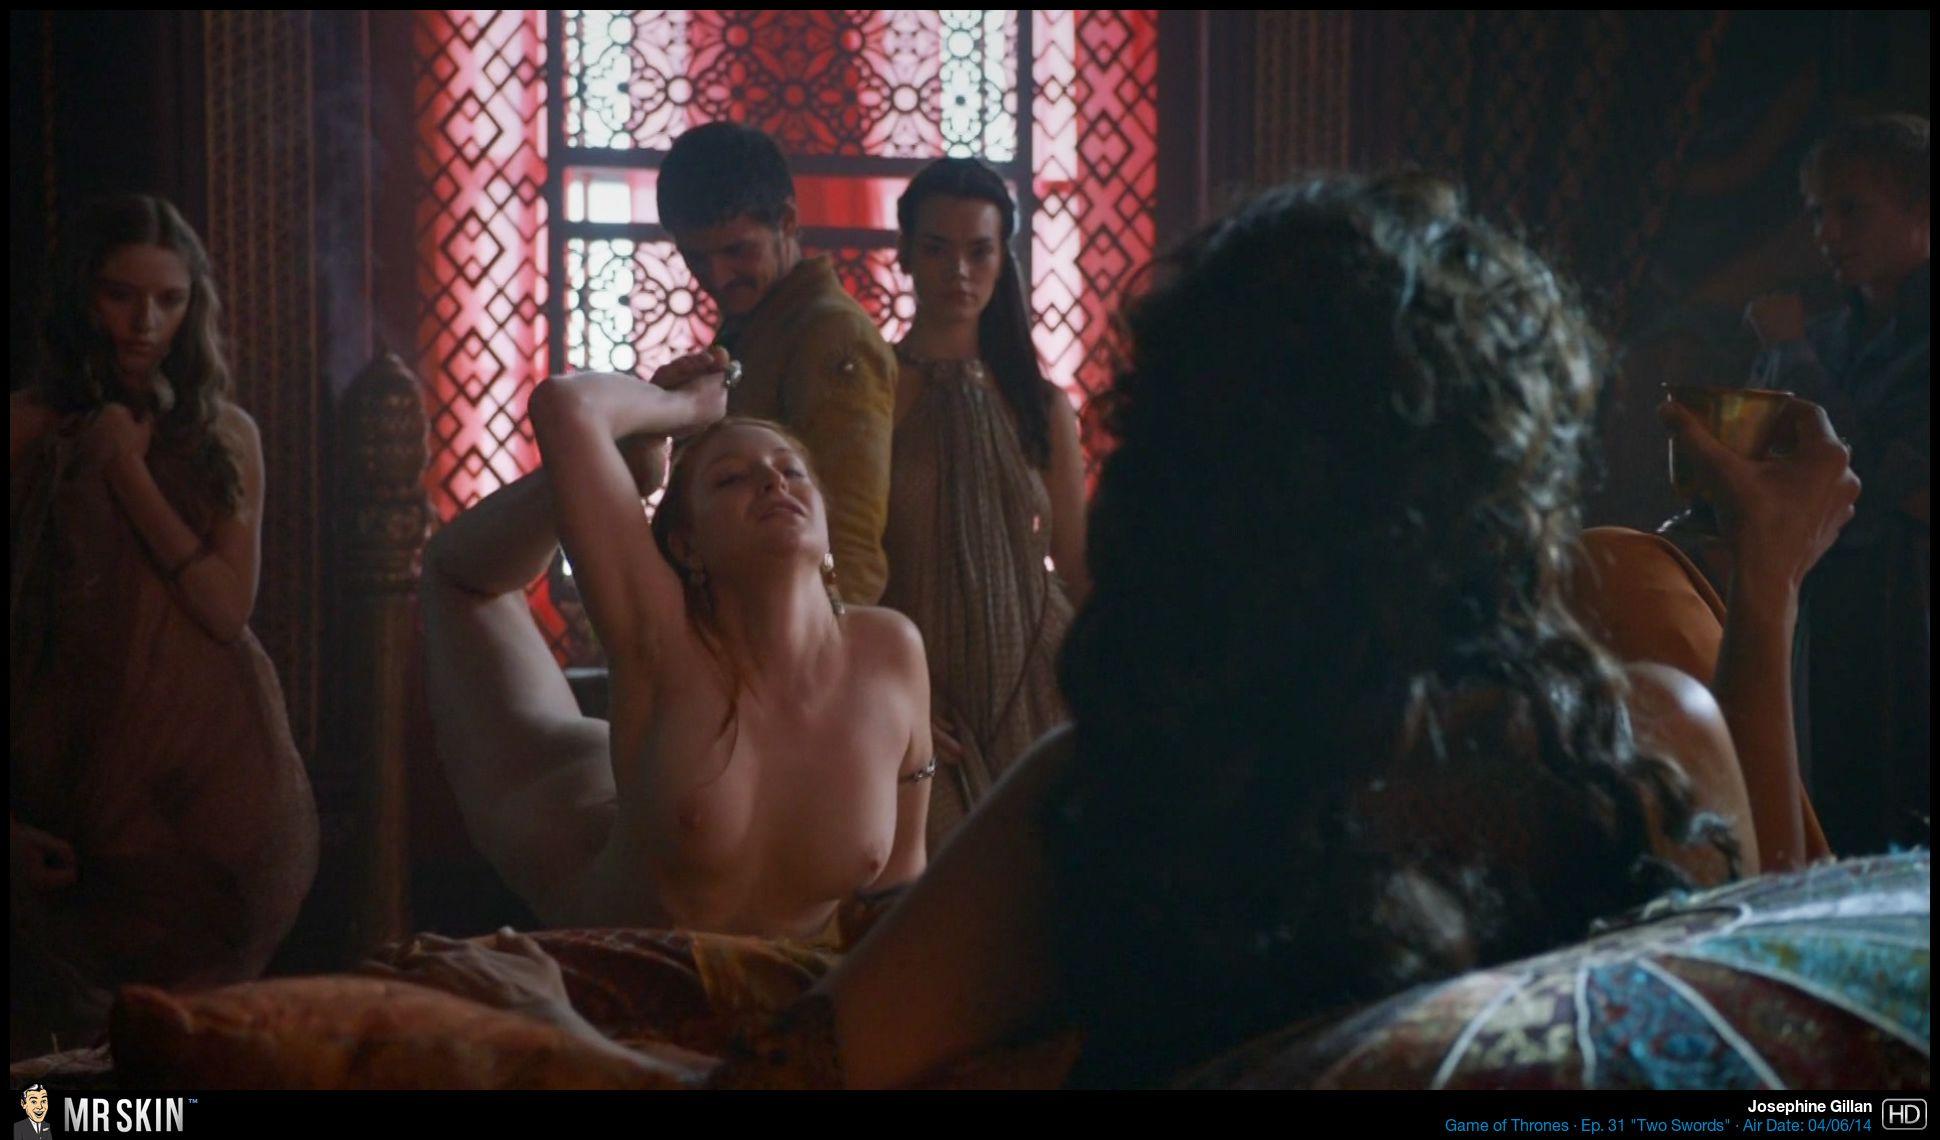 prostitutas callejeras madrid escena prostitutas juego de tronos